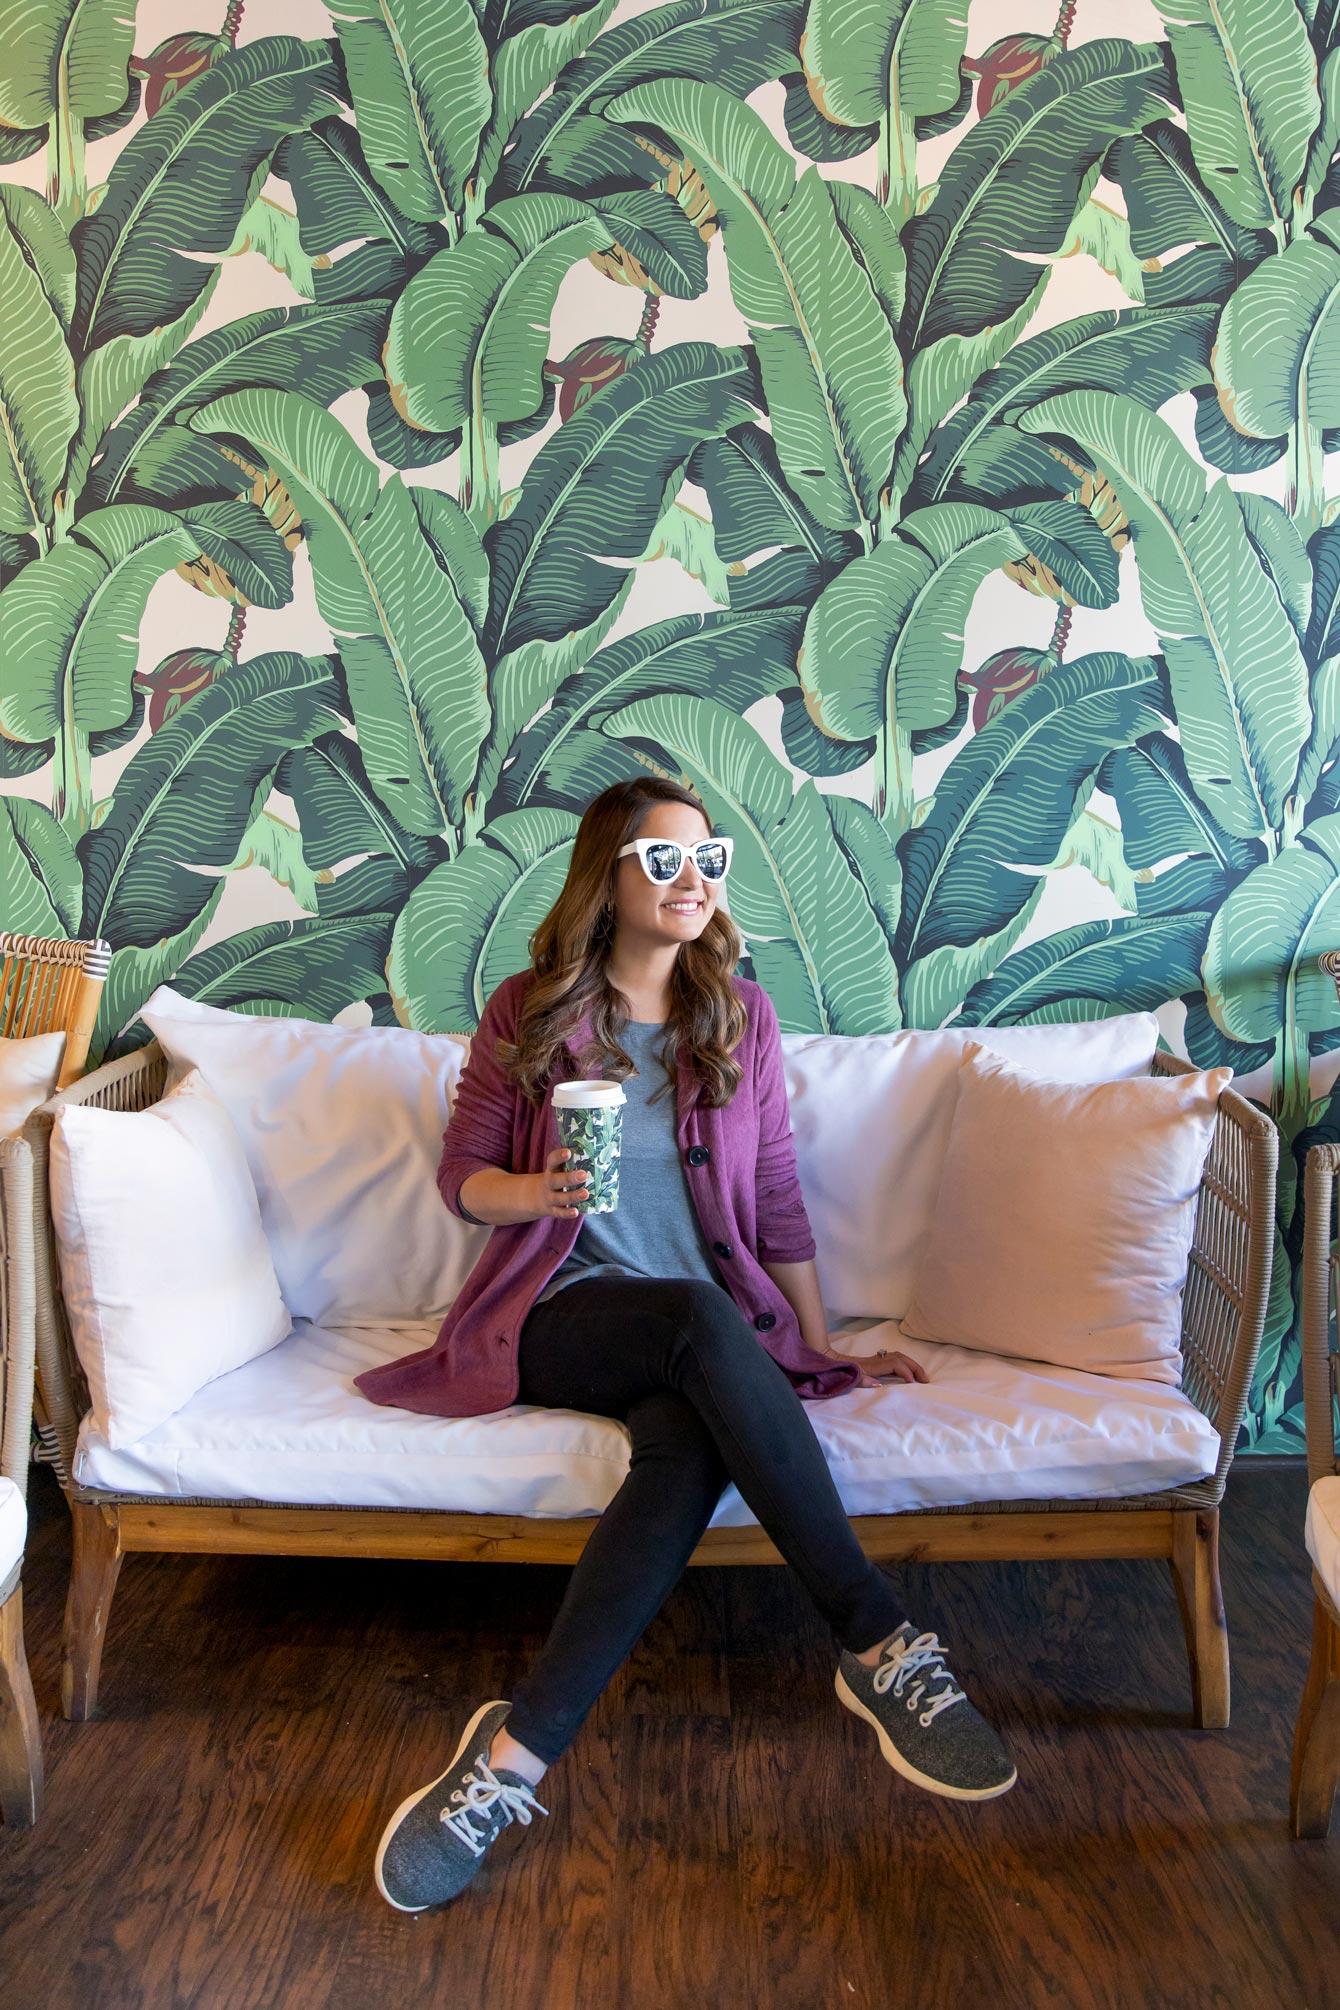 Rawberri Palm Print Wallpaper